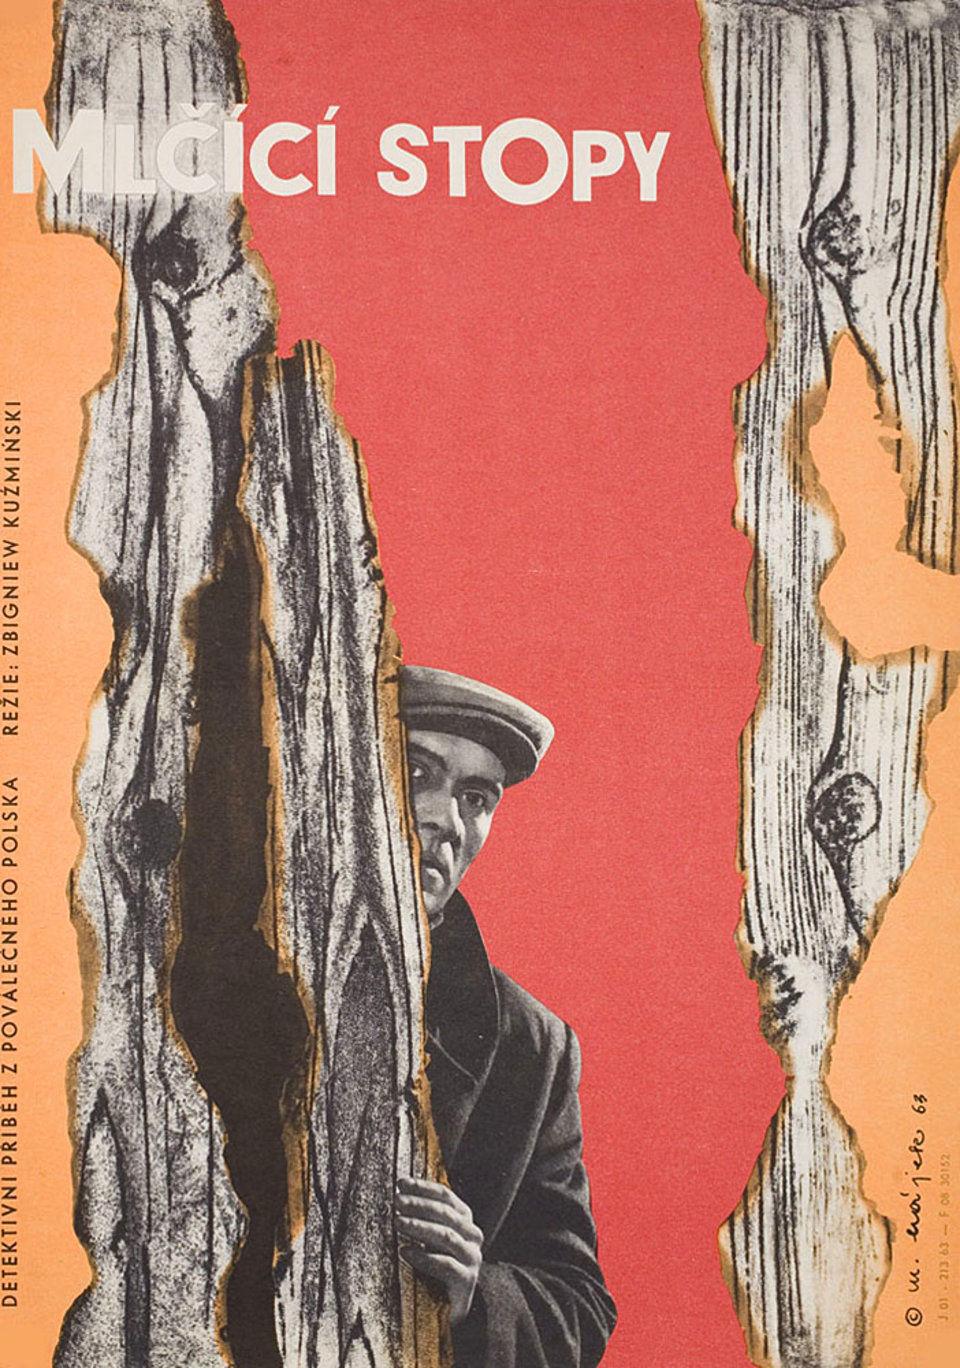 silent-story-czech-movie-poster